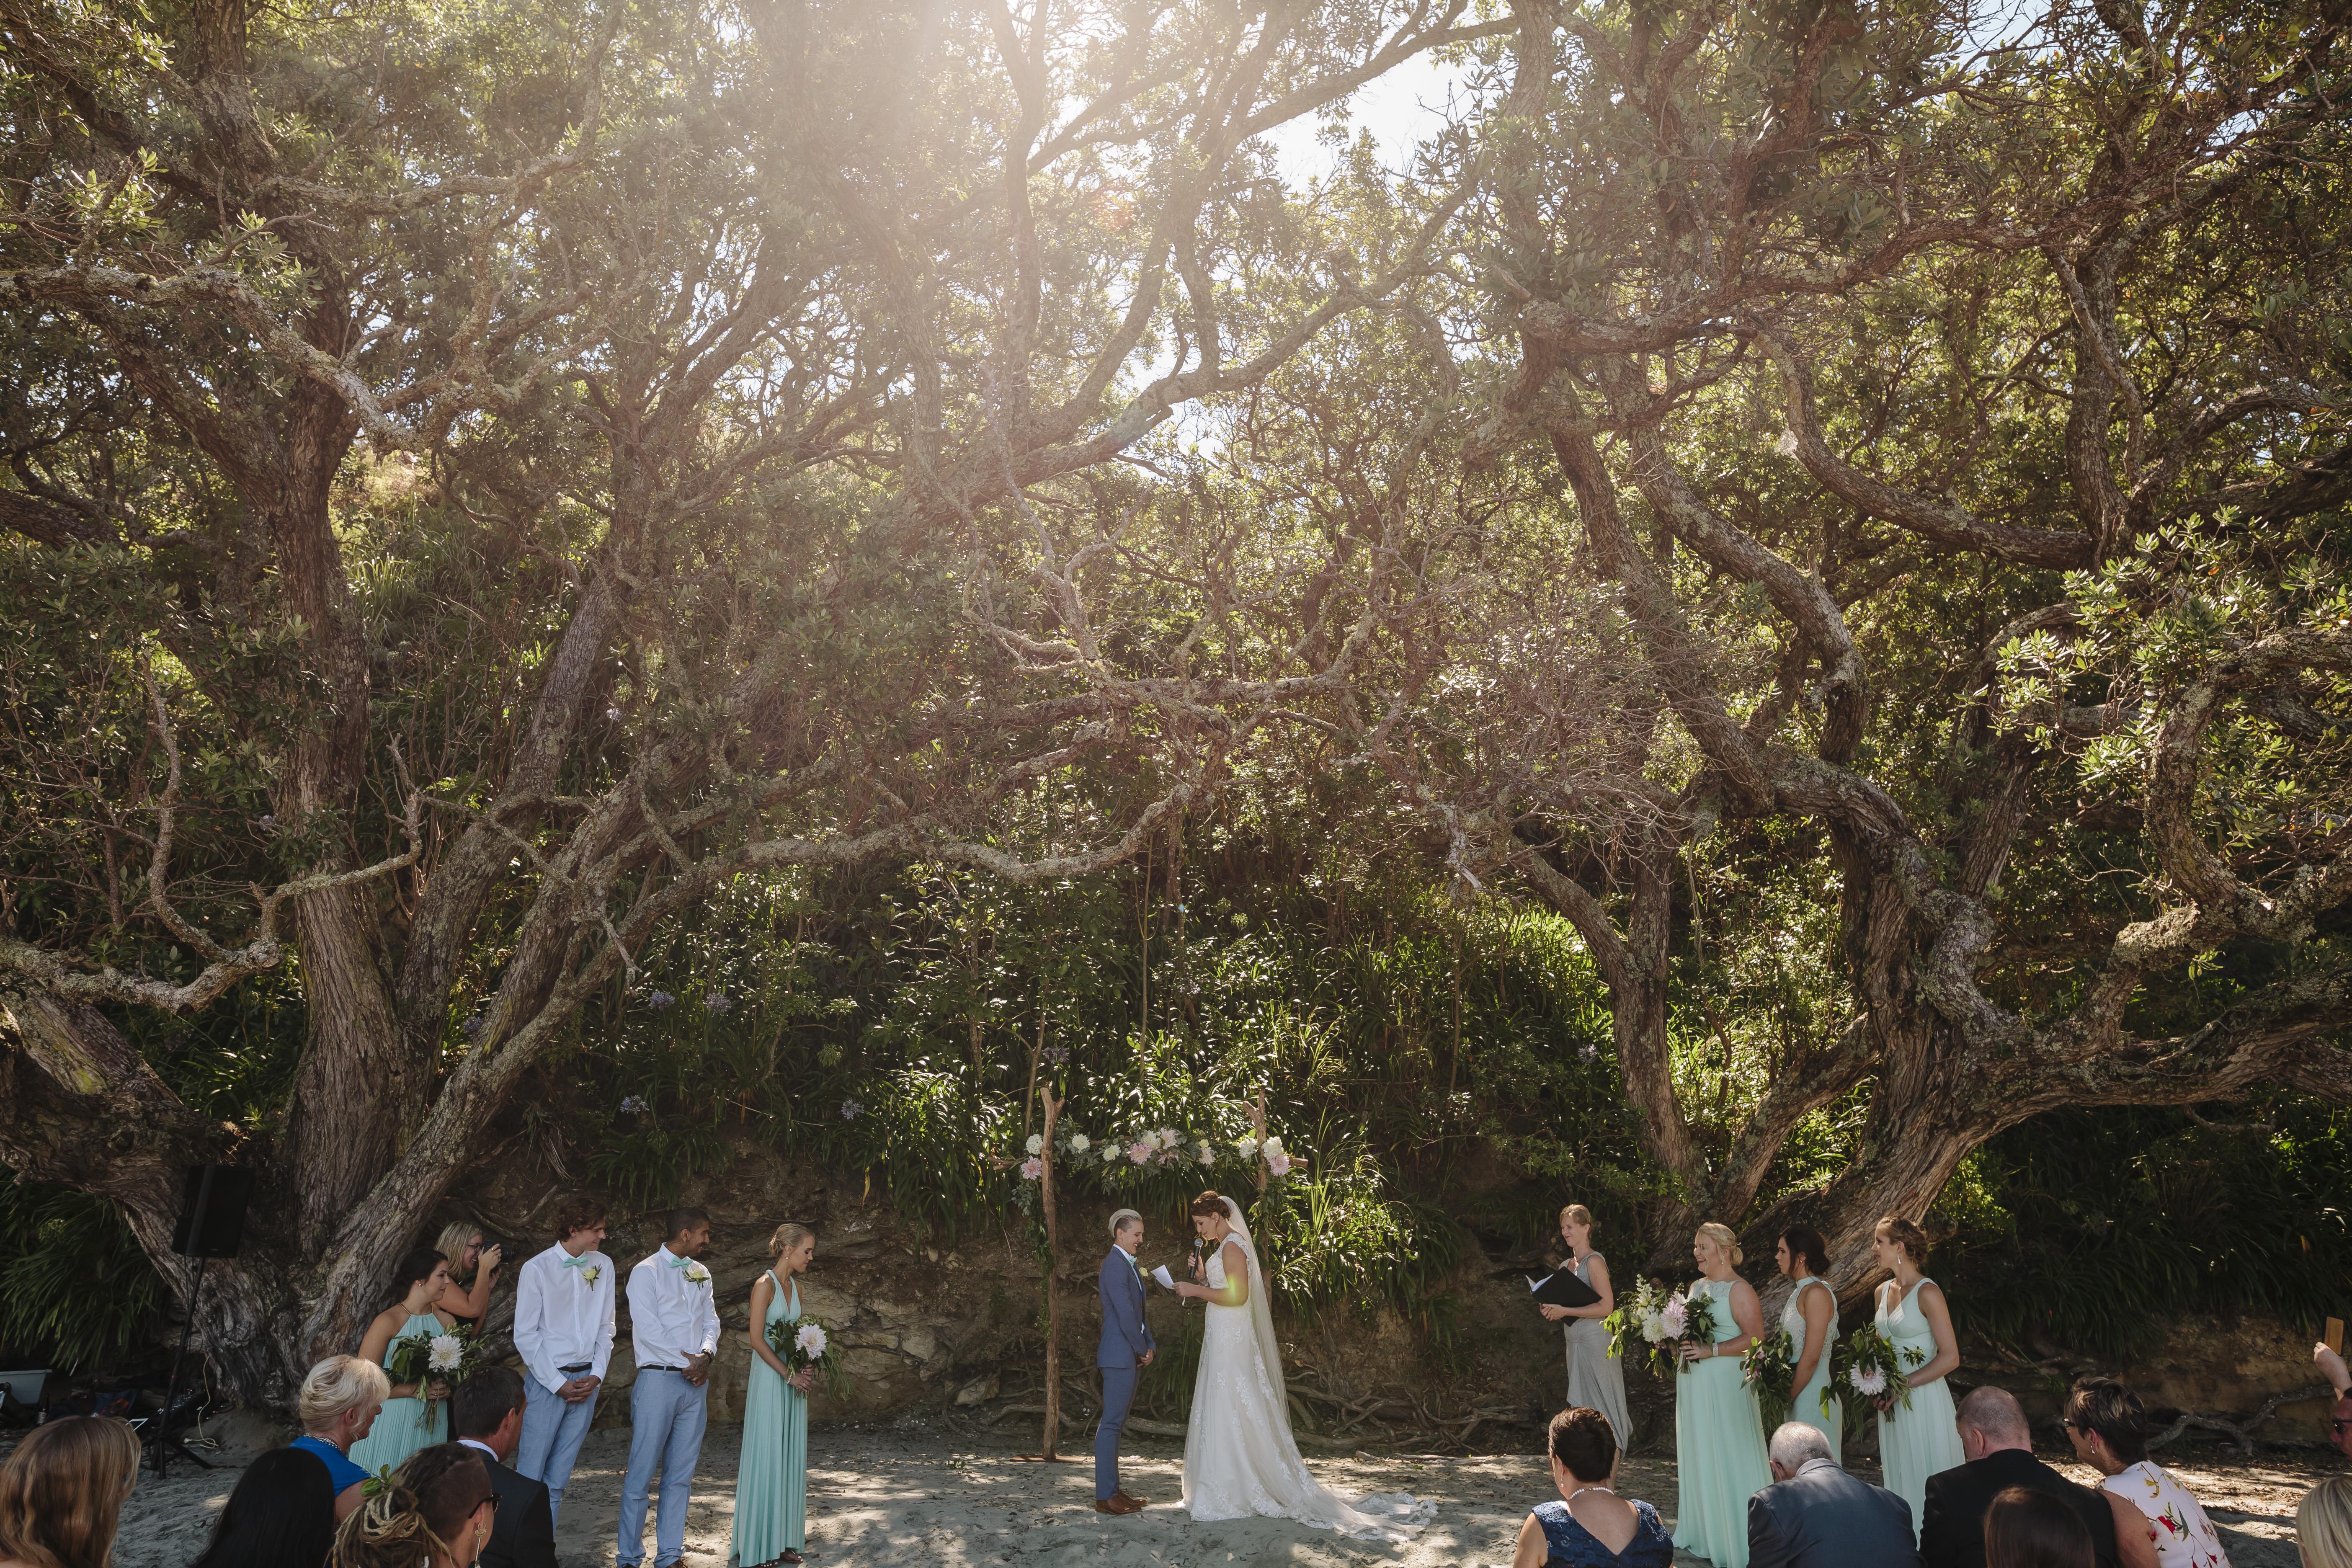 amanda-tash-the-official-photographers-wedding__mg_9448